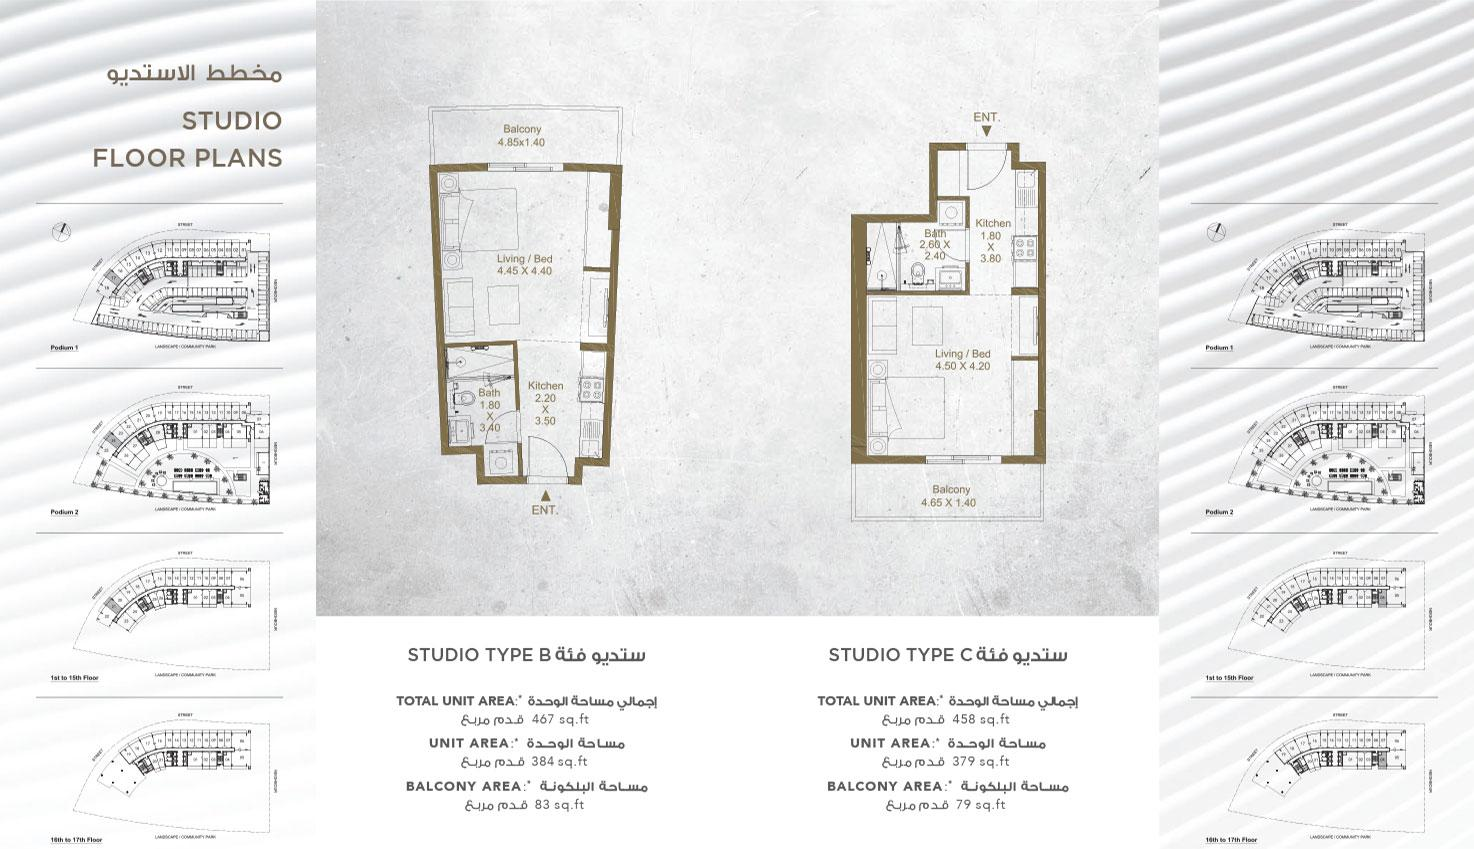 https://drehomes.com/wp-content/uploads/Studio-Type-B-Unit-Area-467SqFt.jpg